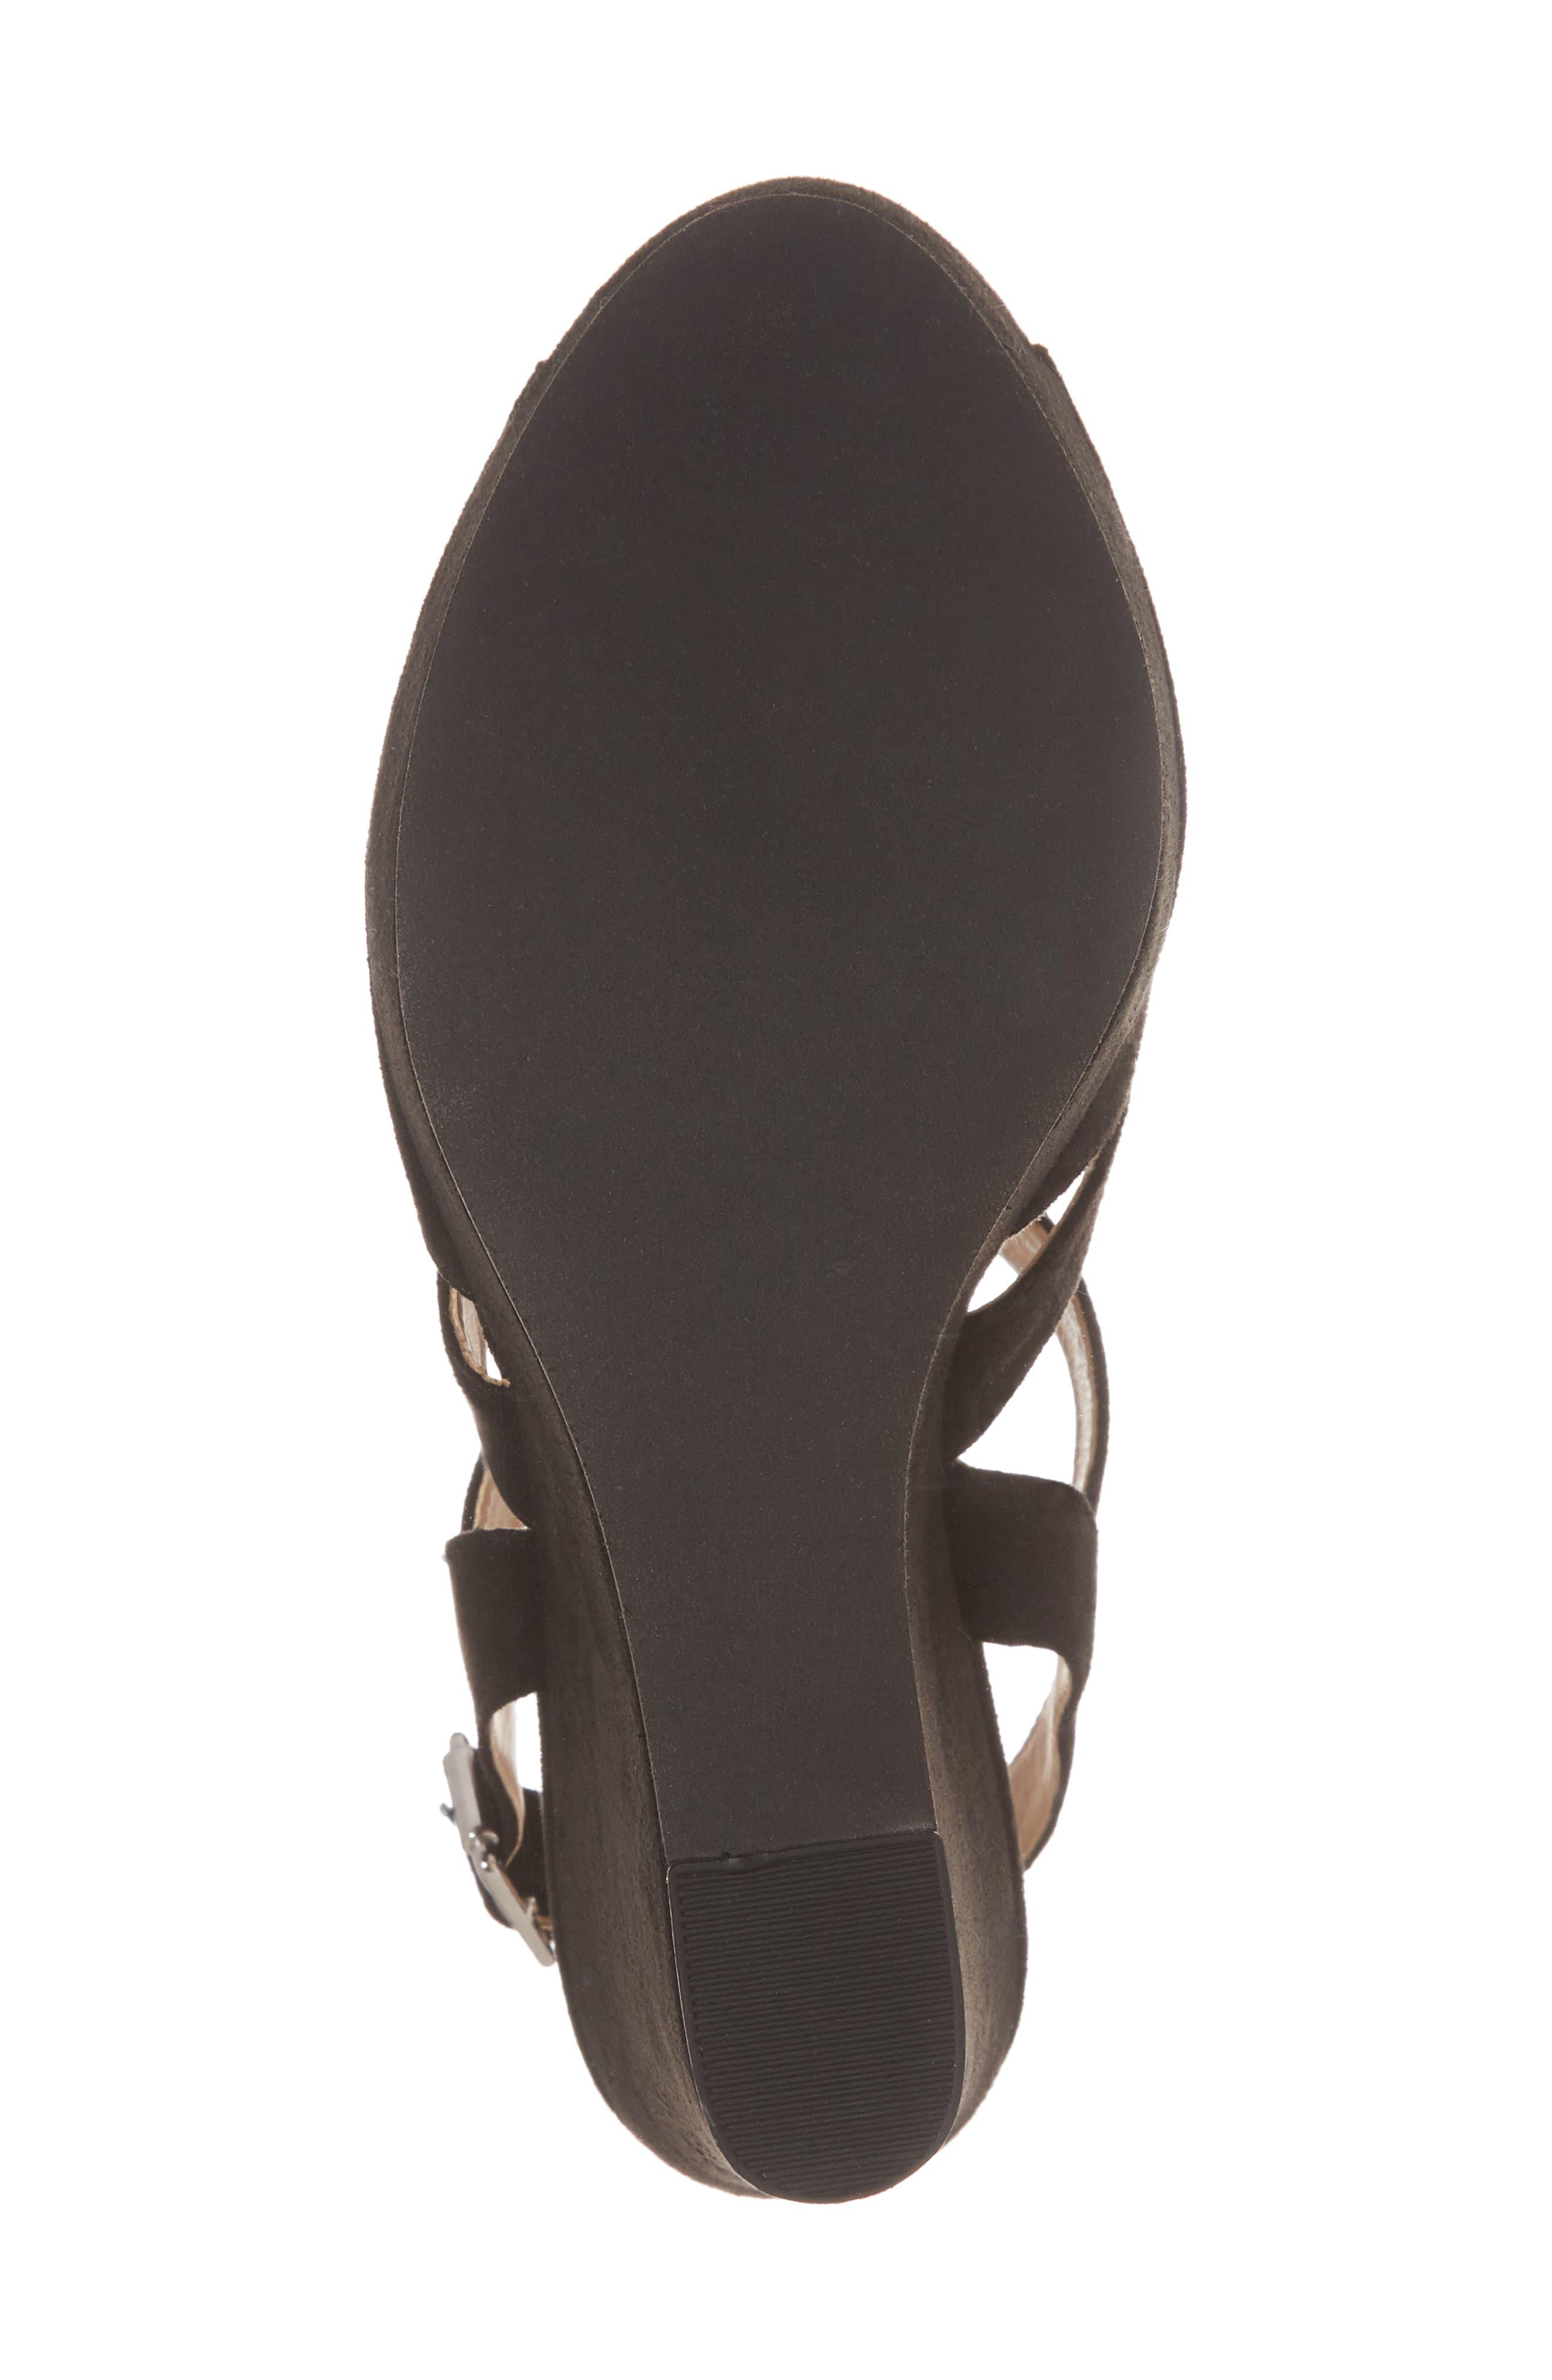 Sunny Platform Wedge Sandal,                             Alternate thumbnail 6, color,                             001